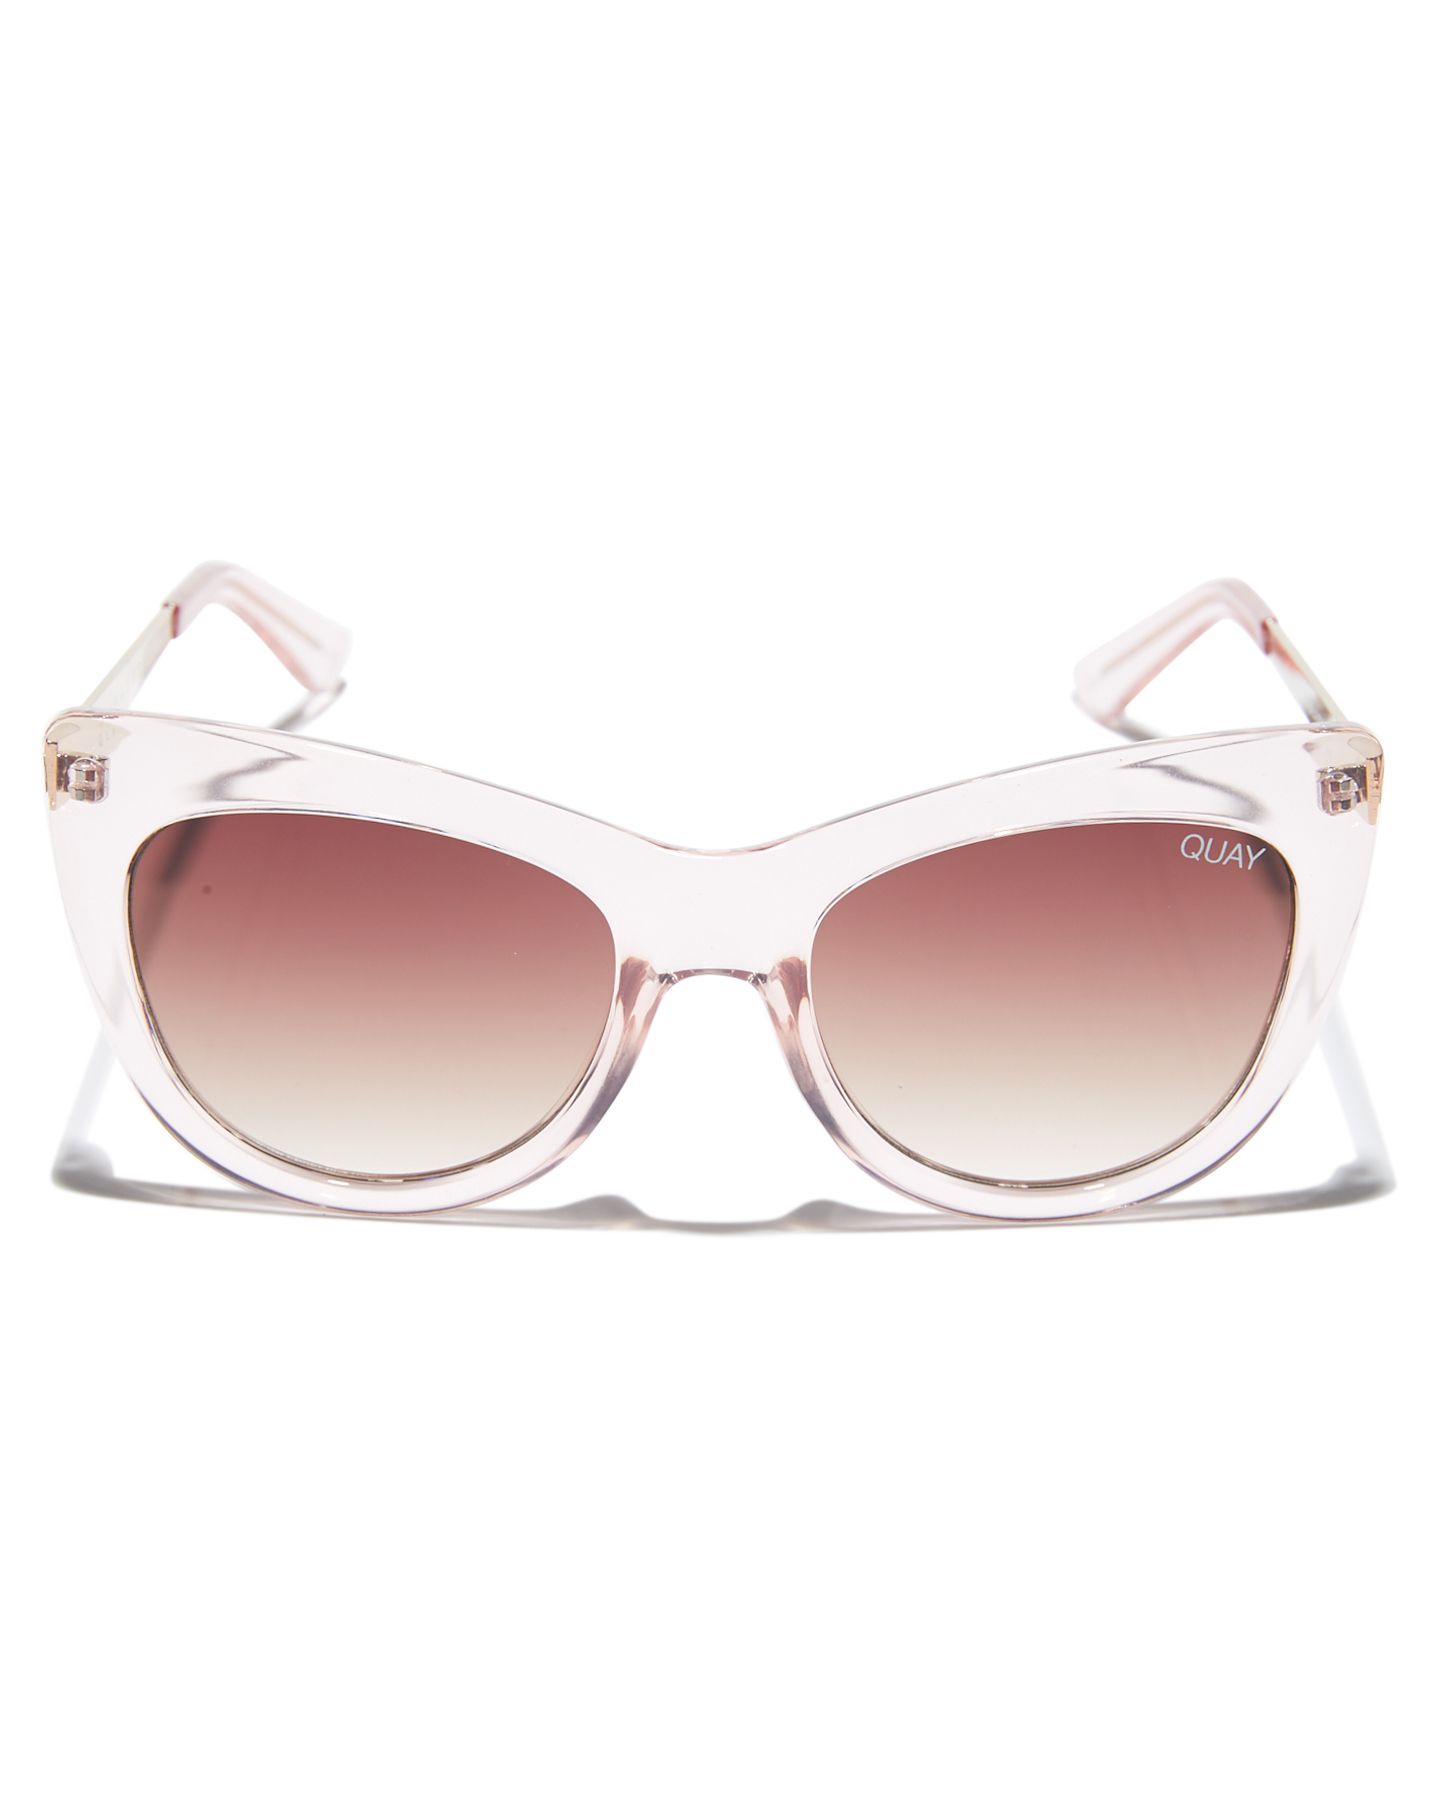 8b1a1c60a5a New Quay Eyewear Women s Steal A Kiss Sunglasses Stainless Steel Glass Pink  N A